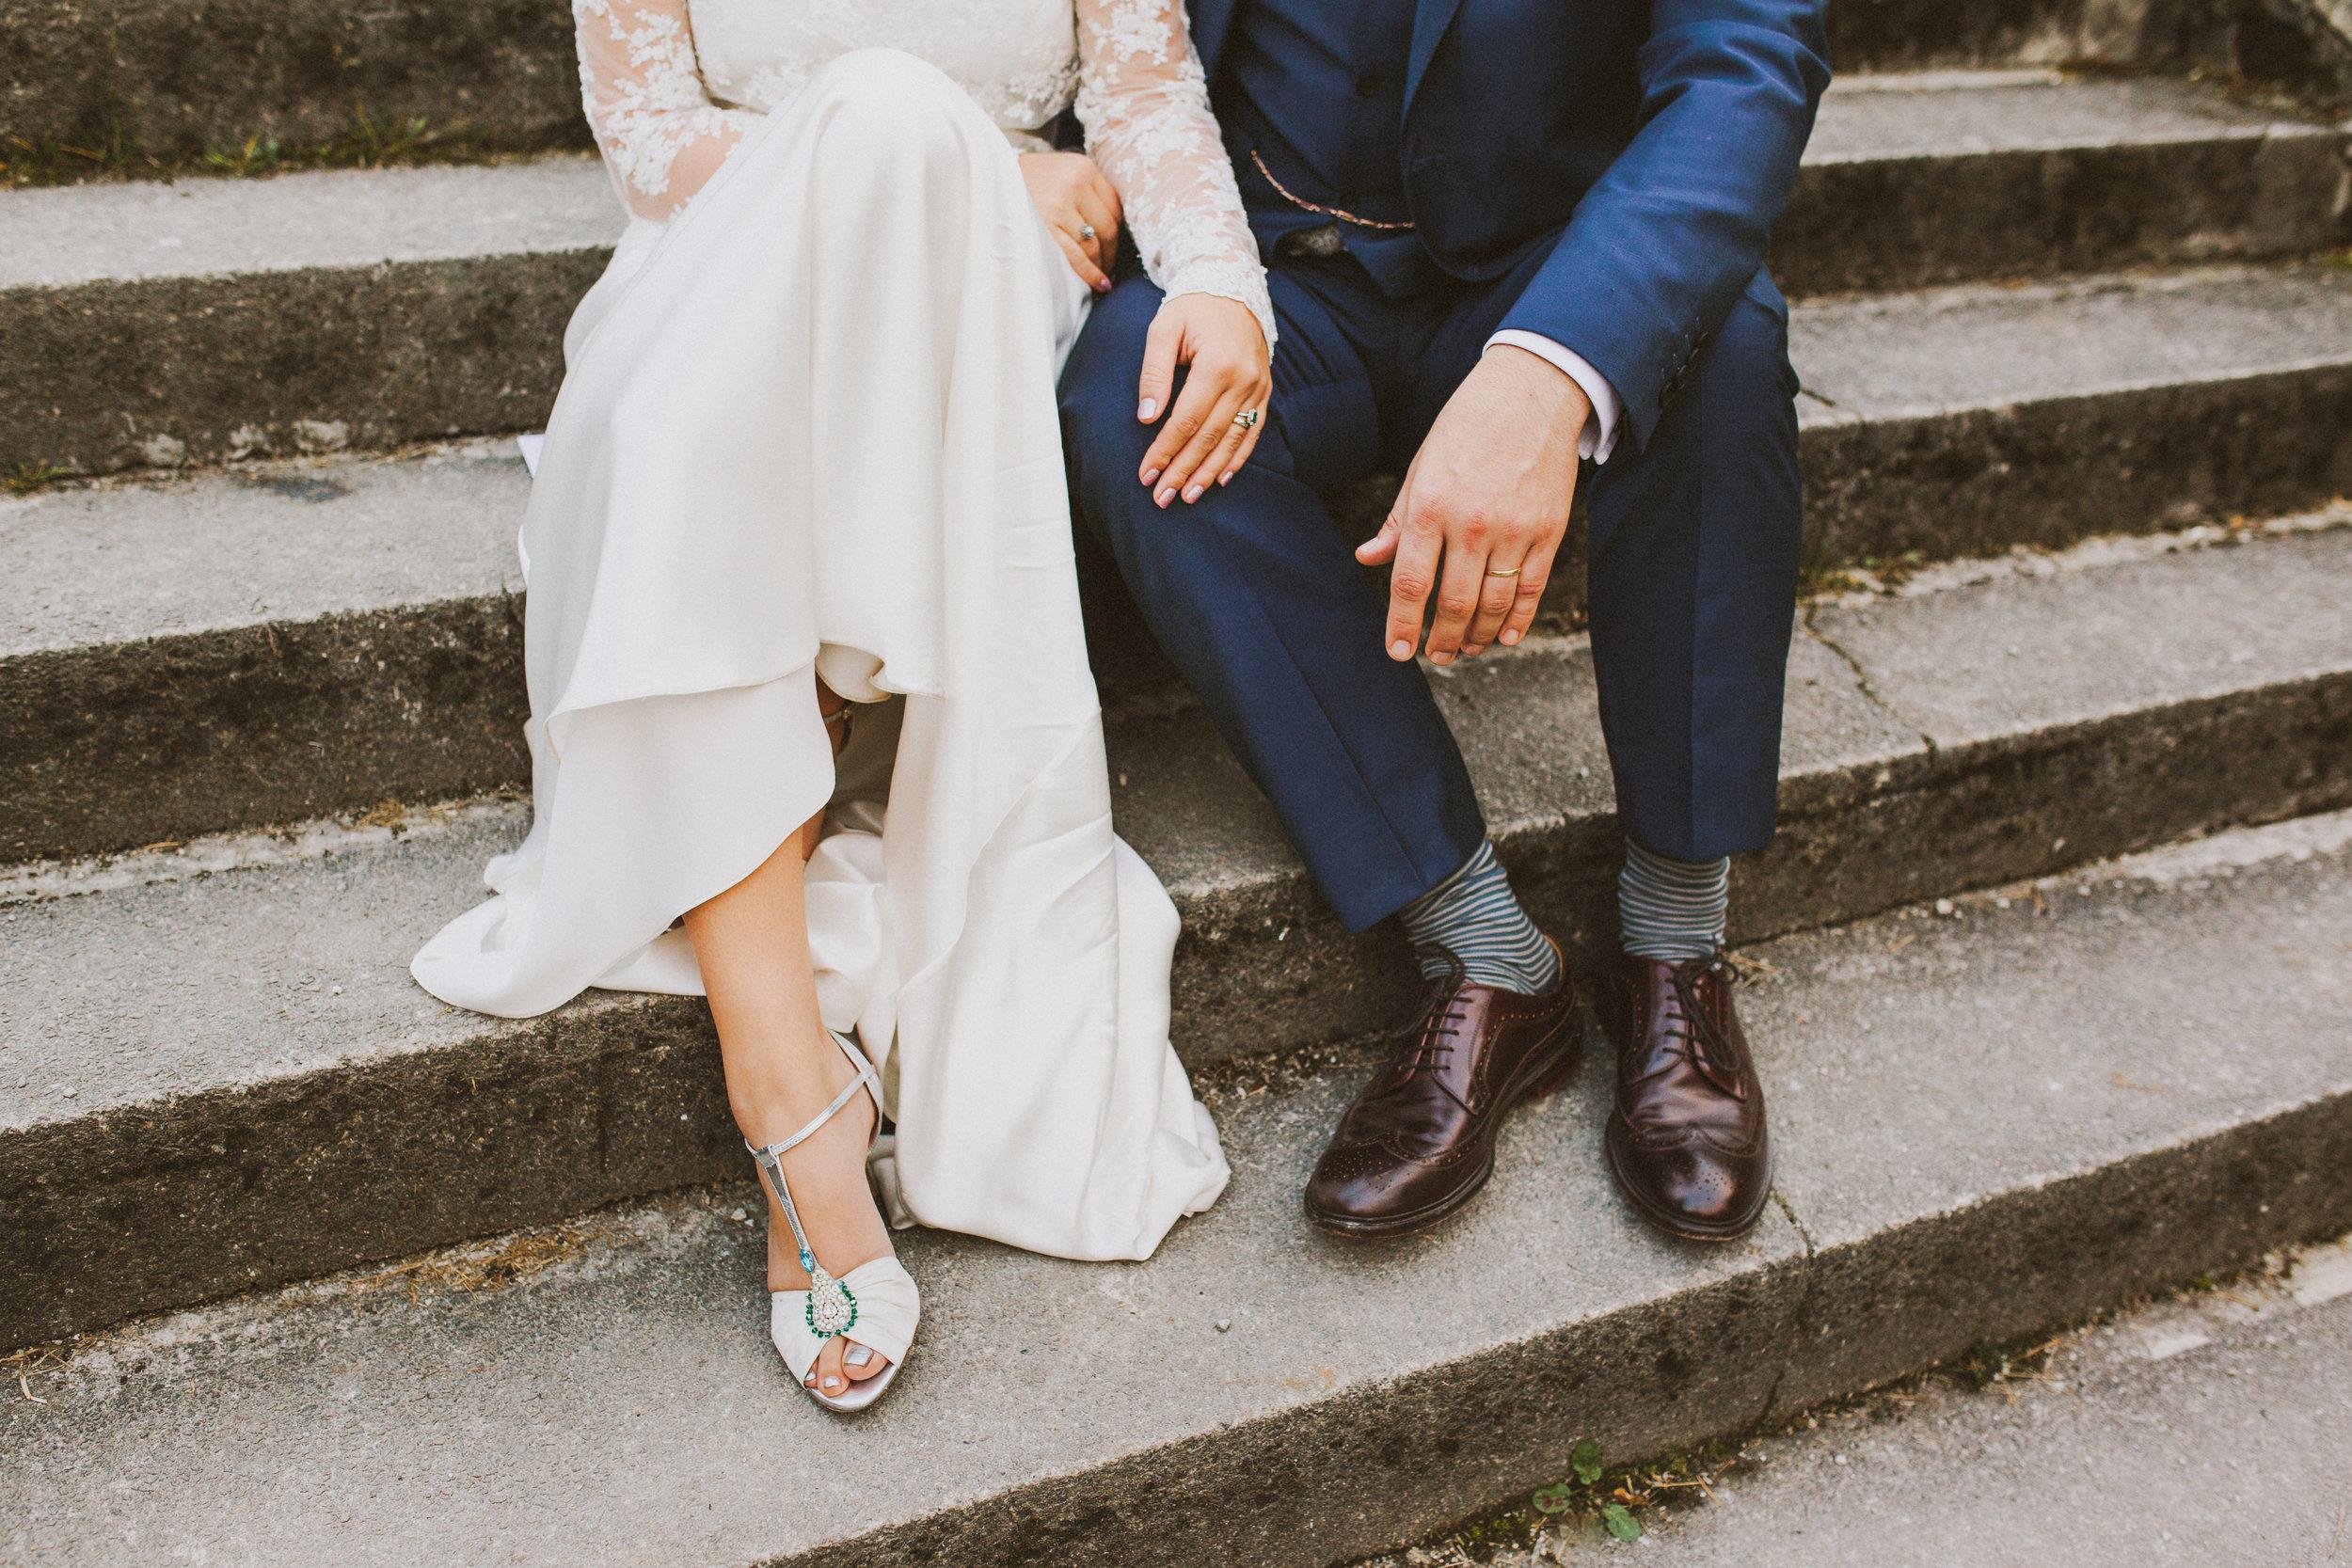 Jo-Peak-District-Autumn-Wedding-Bespoke-Vintage-Bias-Wedding-Gown-Lace-Jacket-Susanna-Greening-Matlock-15